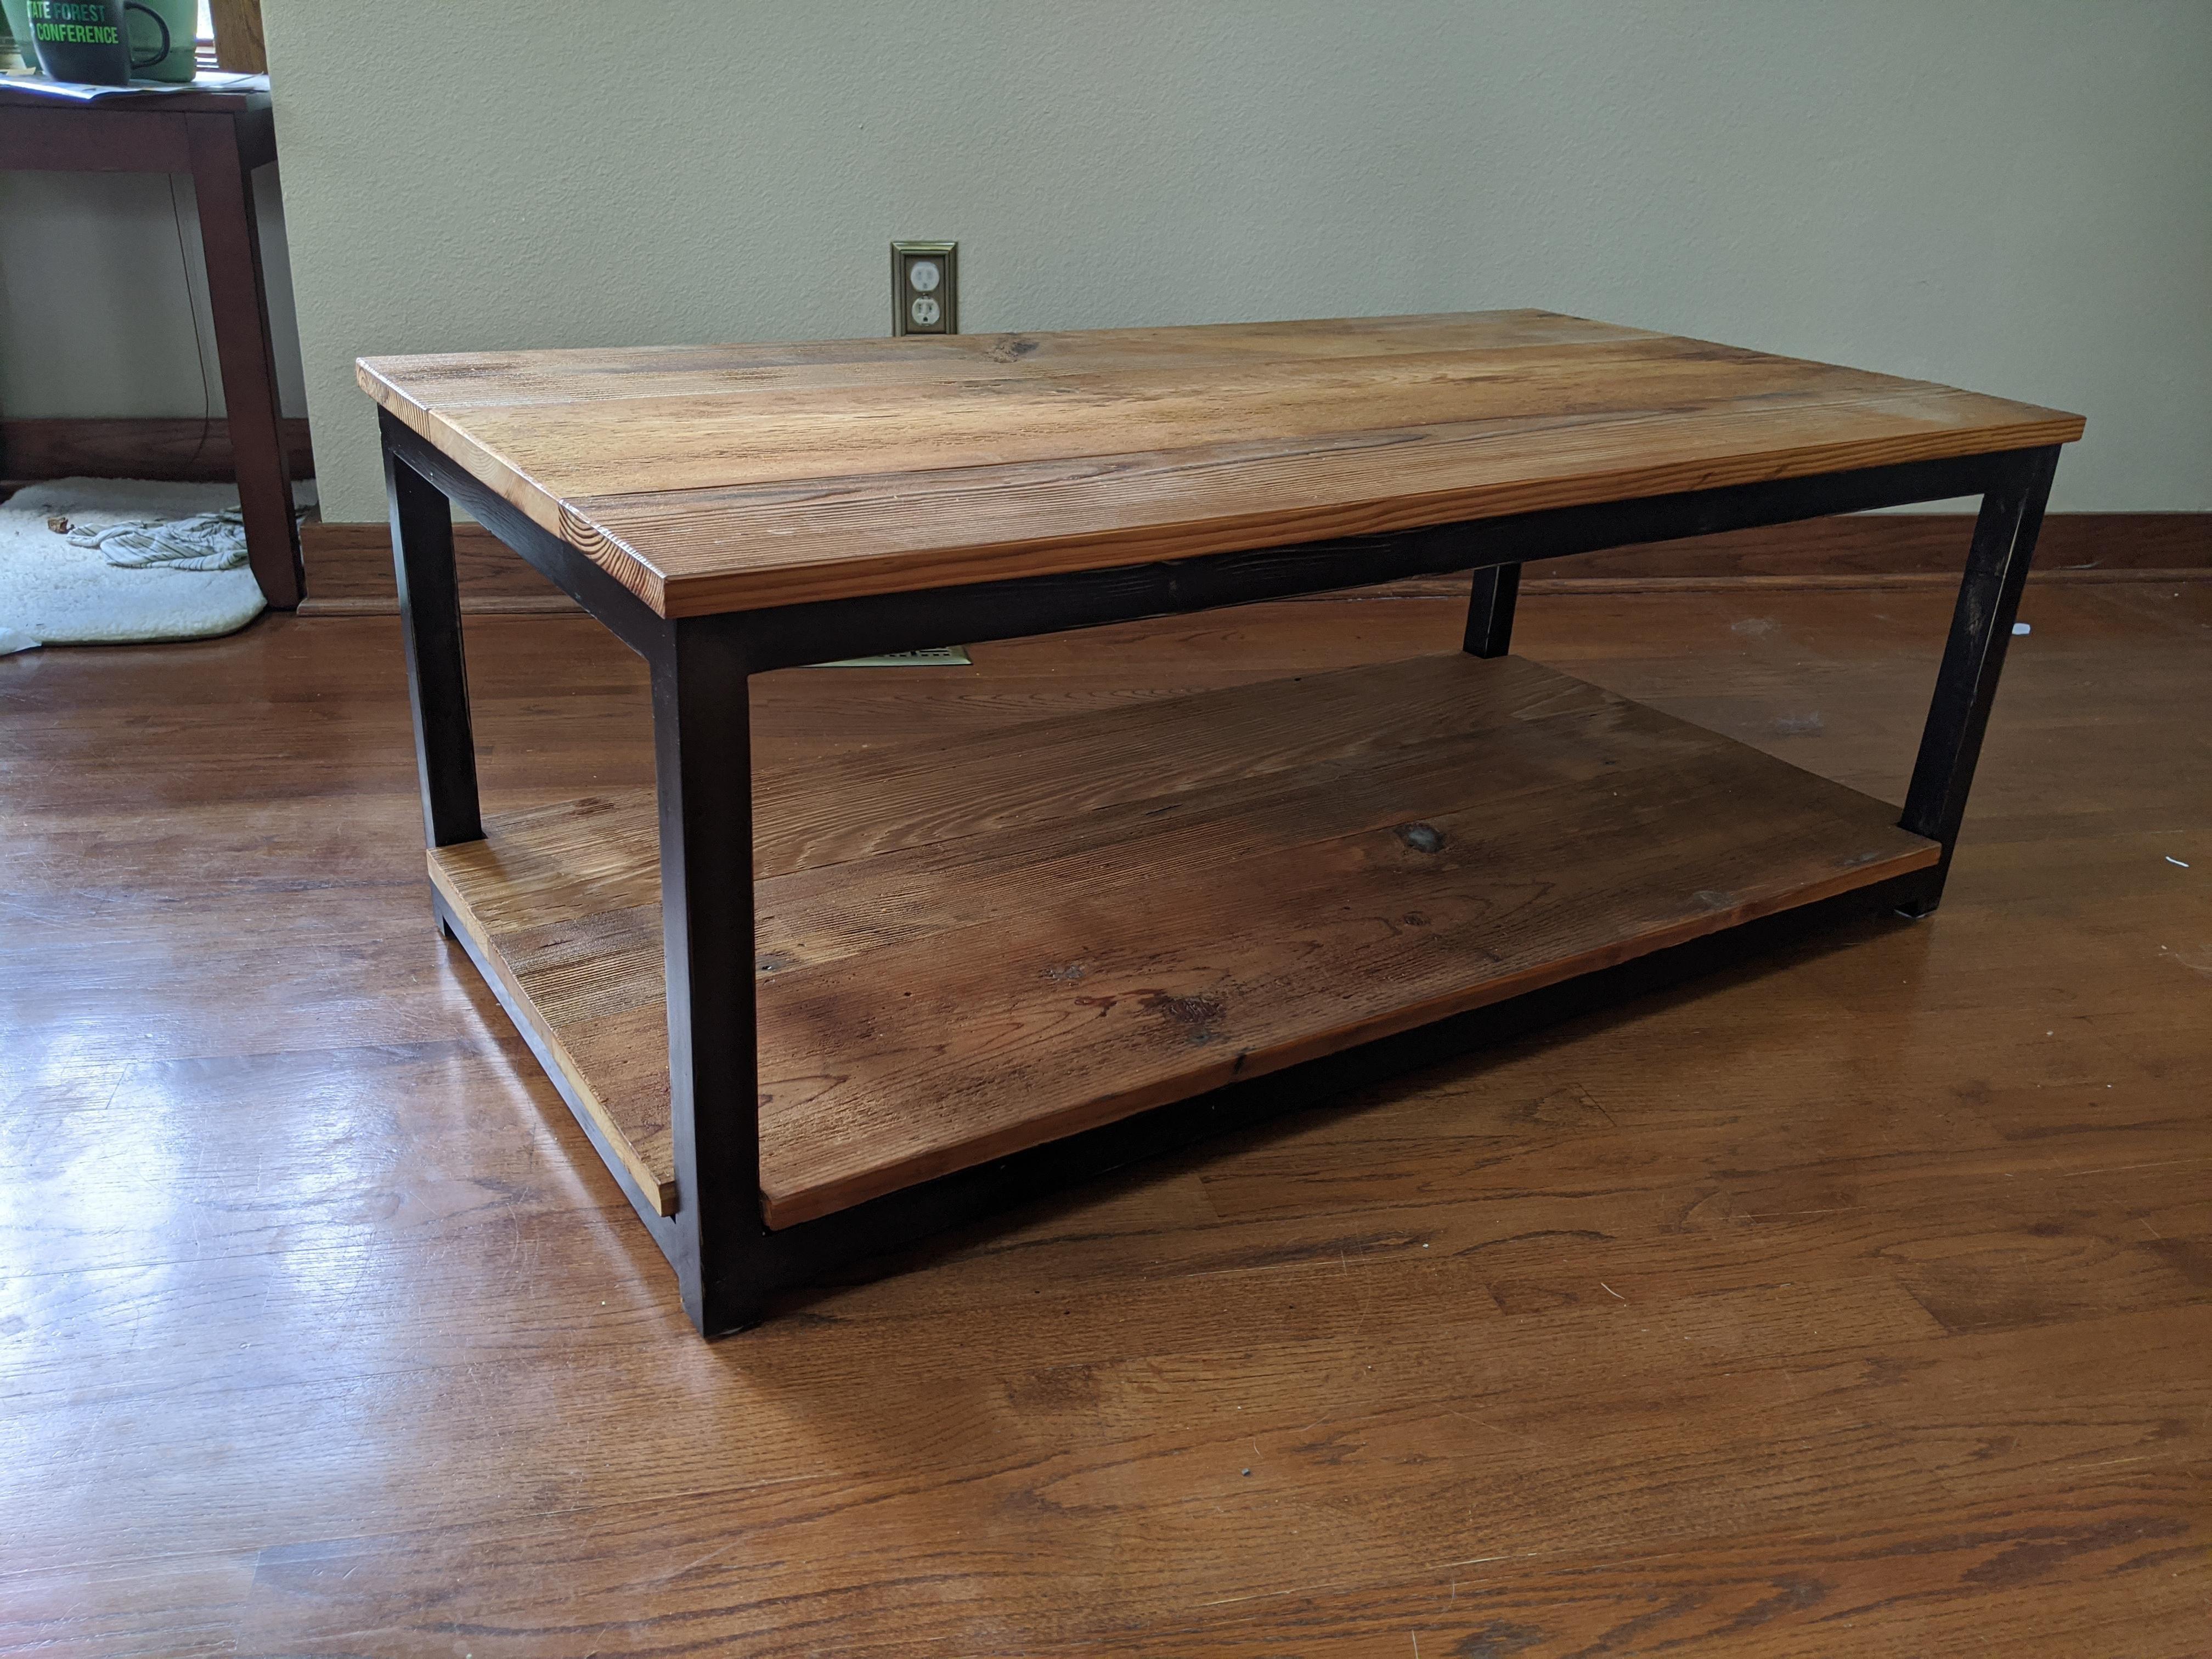 My First Big Build 2x4 And Barn Wood Coffee Table In 2021 Coffee Table Wood Coffee Table Barn Wood [ 3024 x 4032 Pixel ]